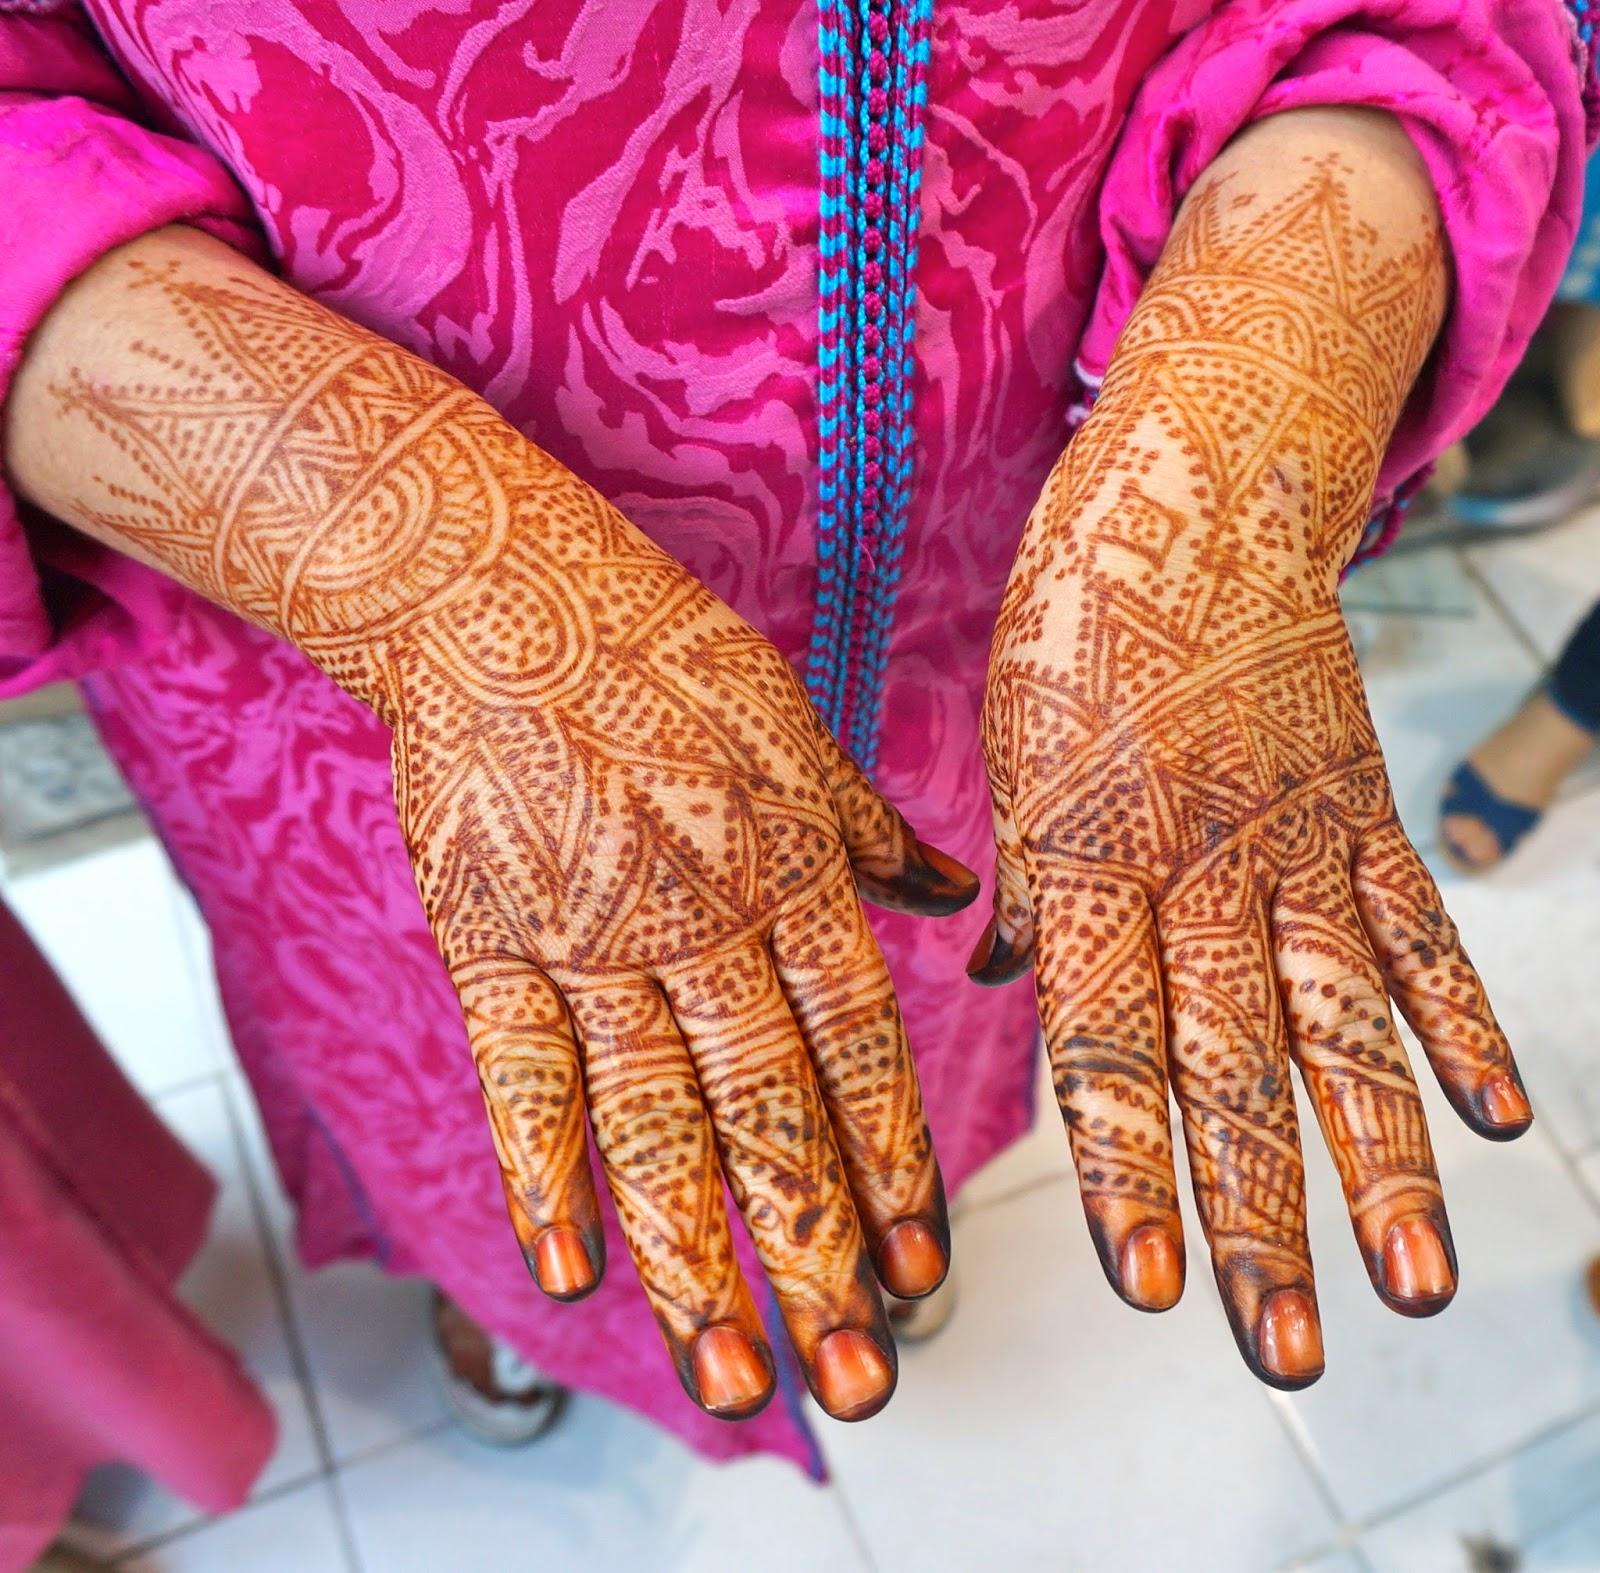 Eshkol HaKofer Hey Hannaya A Moroccan Henna Artist In Action